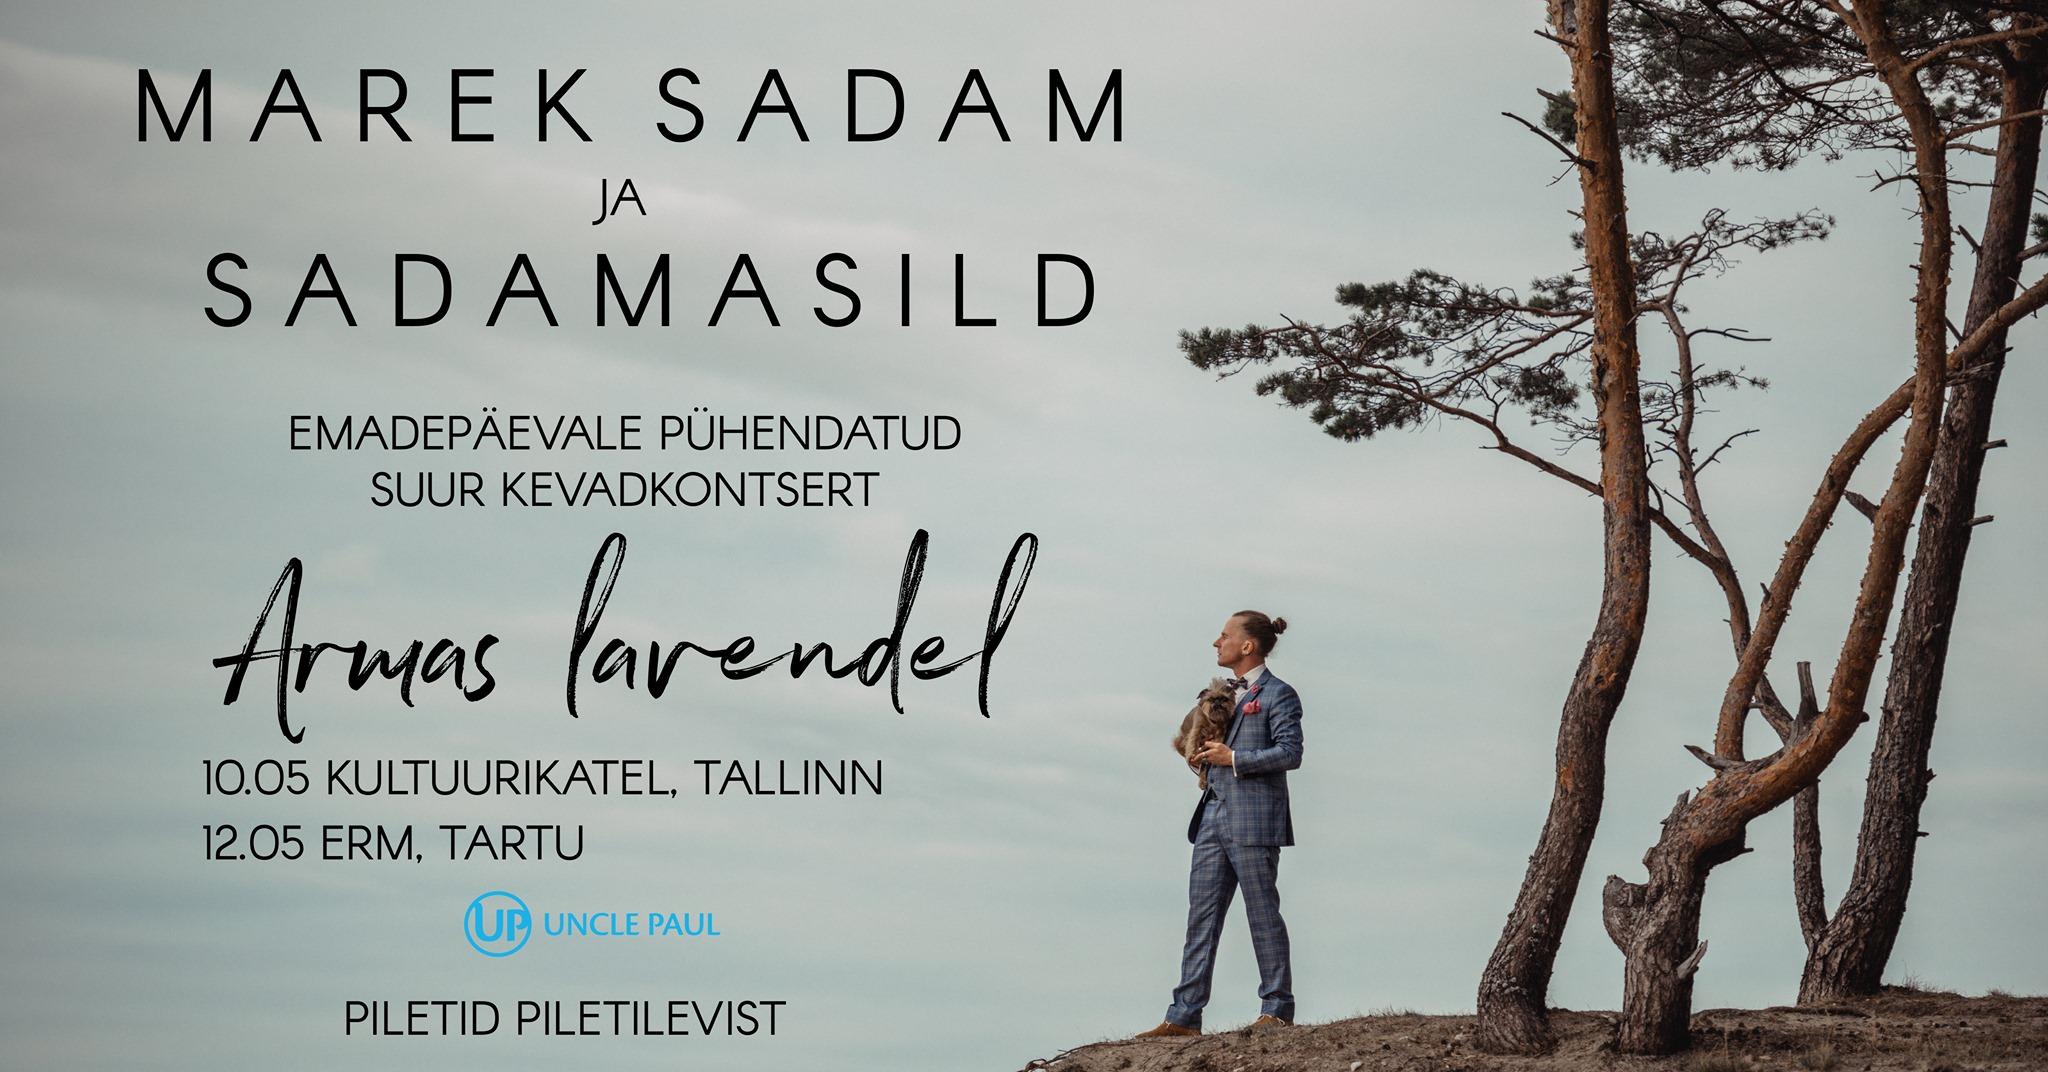 12668MAREK SADAM & SADAMASILD: ARMAS LAVENDEL